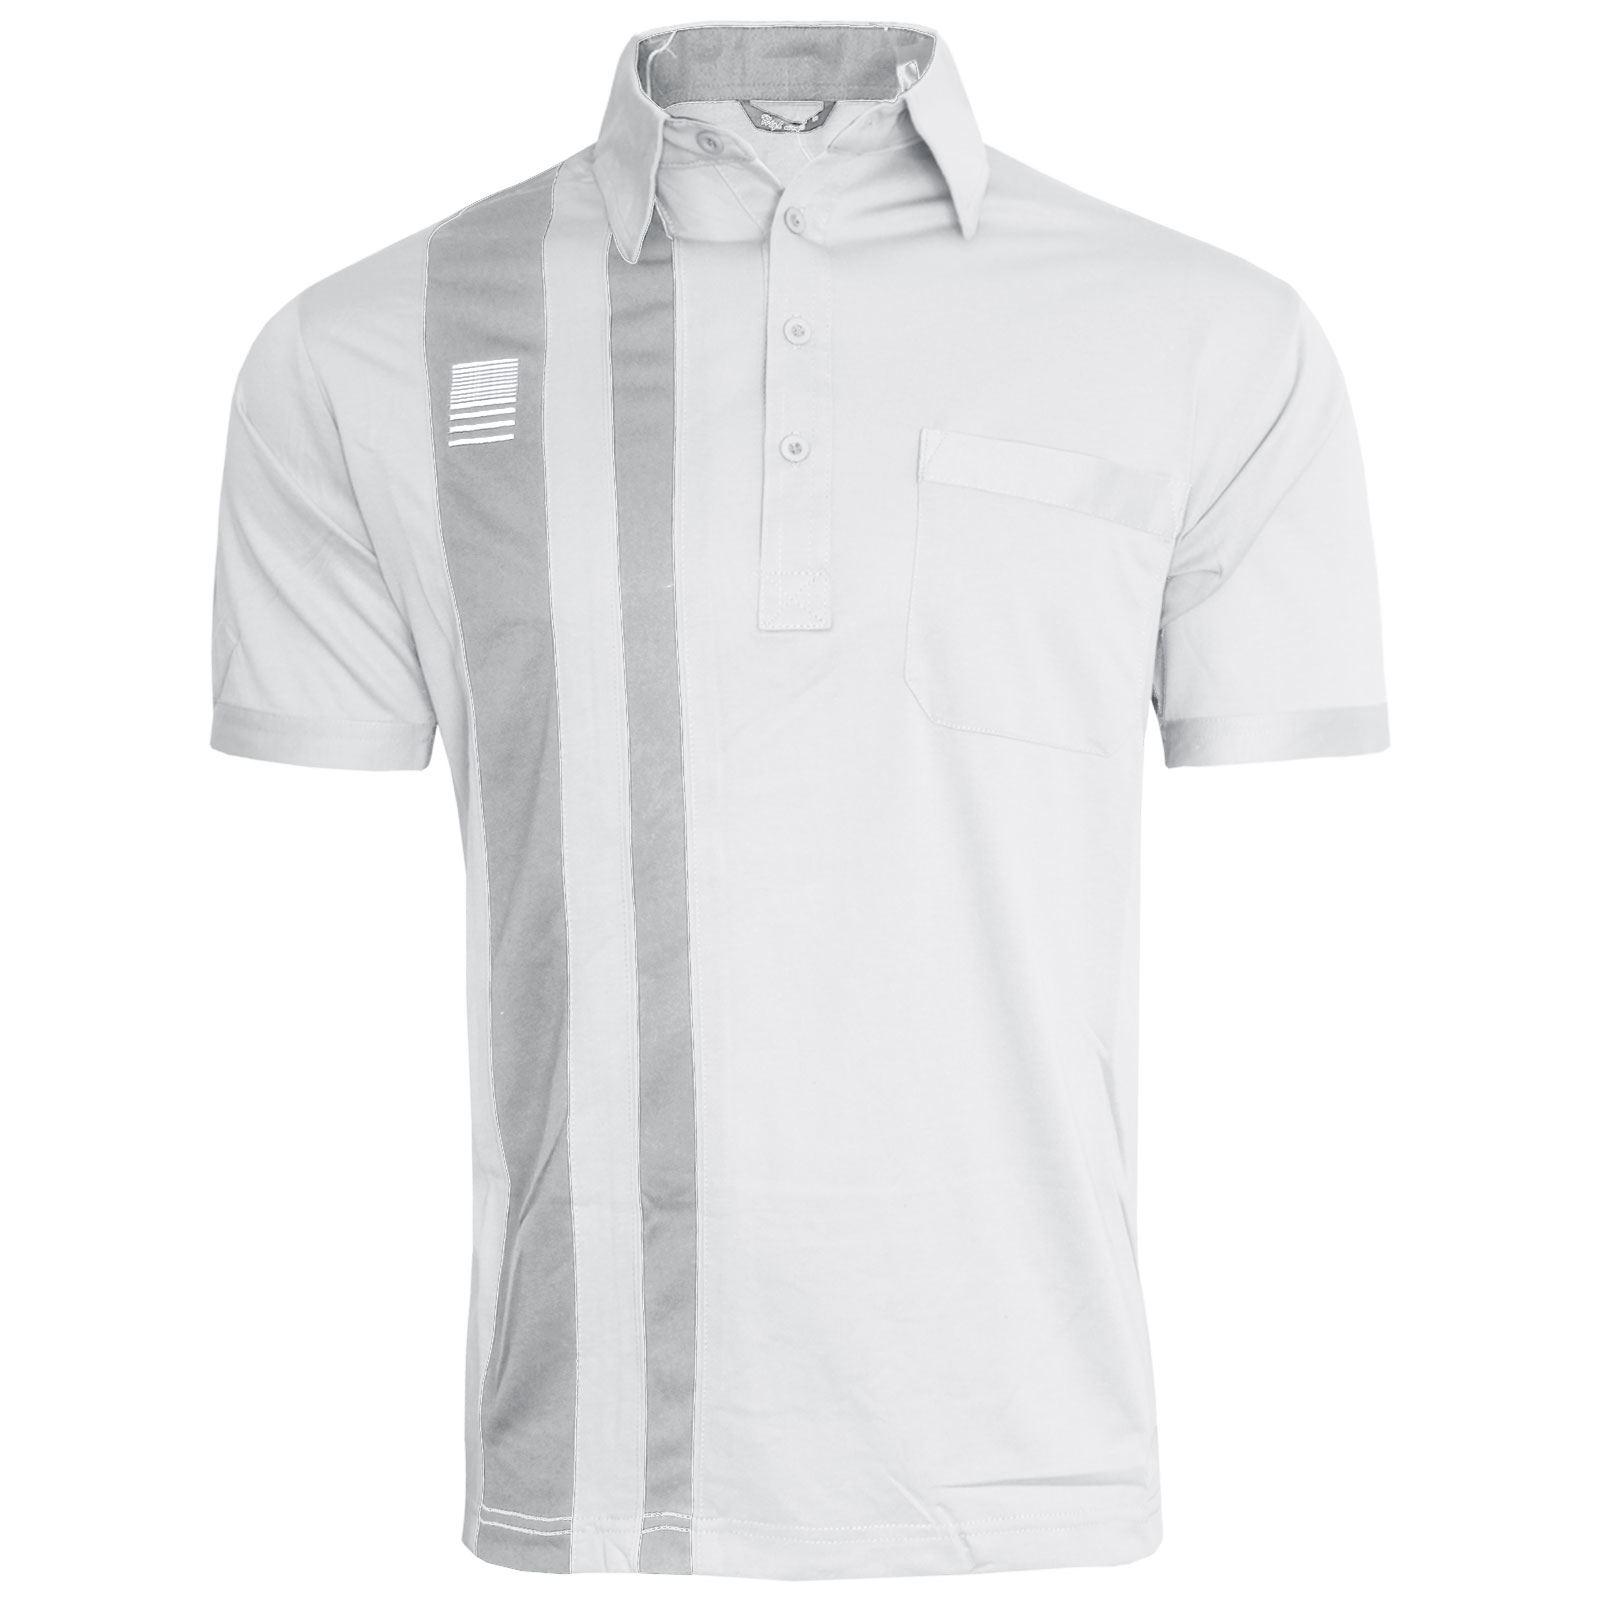 Mens Short Sleeve Plain Design Polo Shirt T Shirt Top